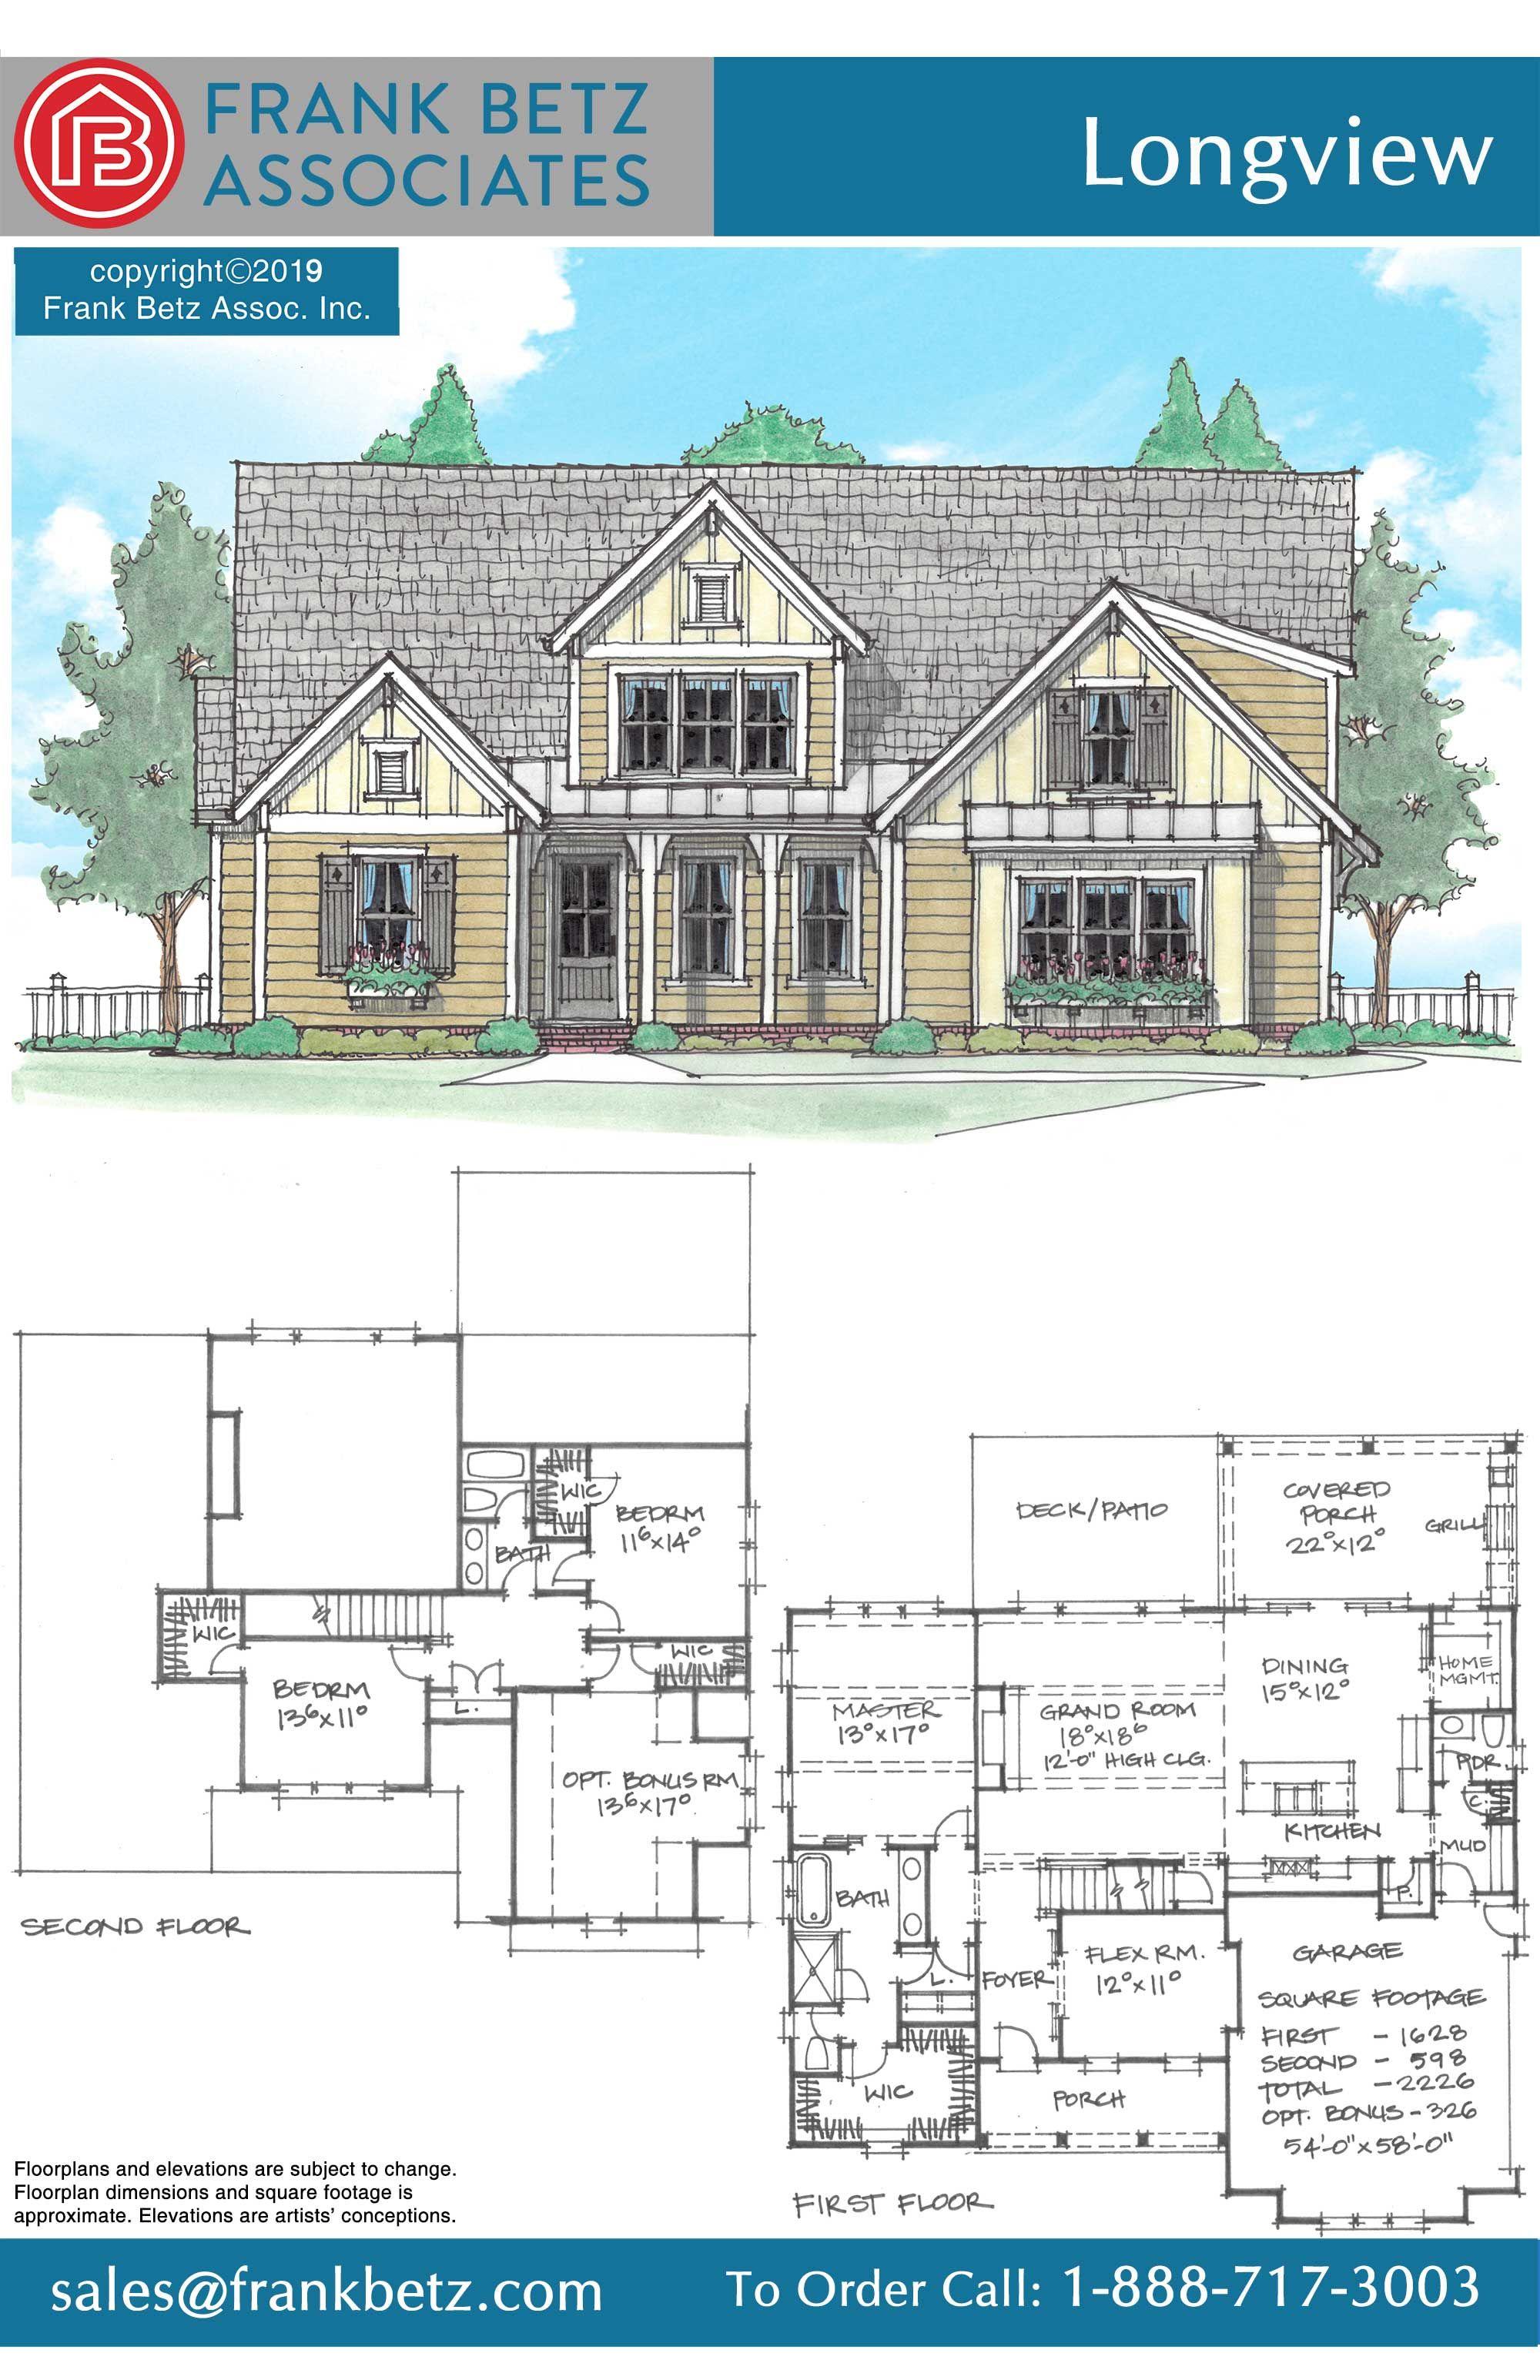 Longview House Plan House Plans Frank Betz House Floor Plans